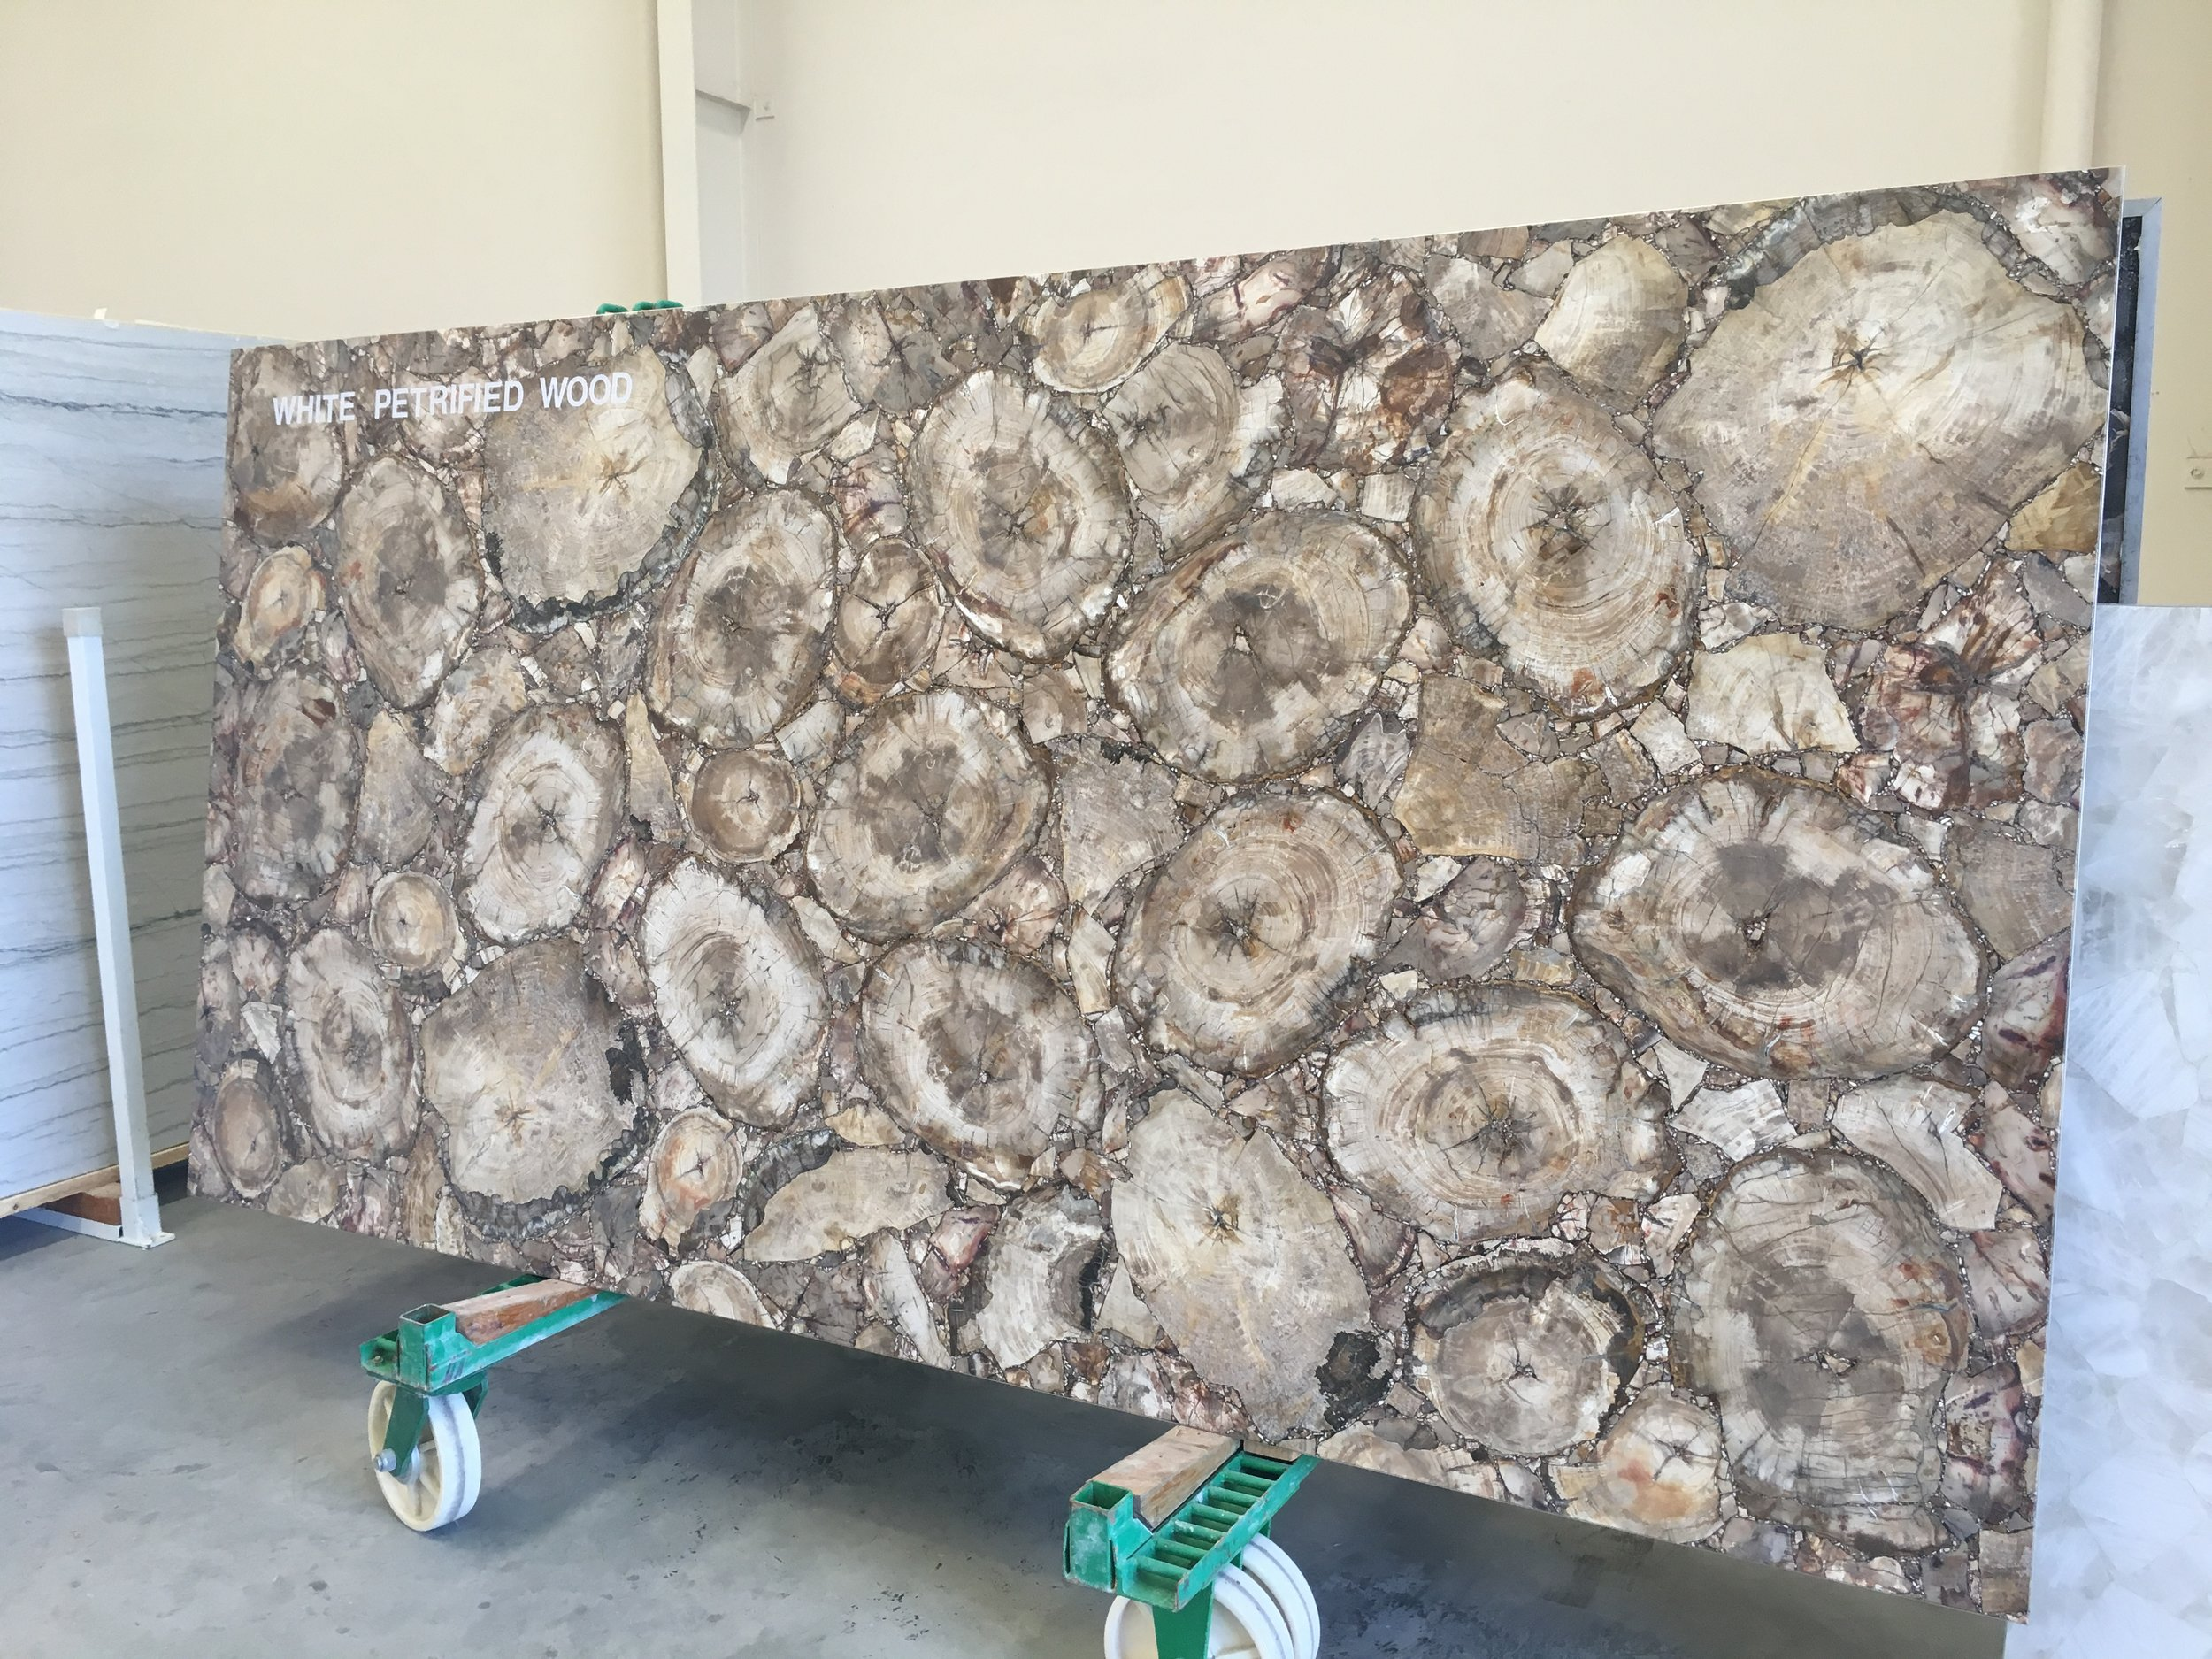 Stunning White Petrified Wood Slab at the Zuccari warehouse